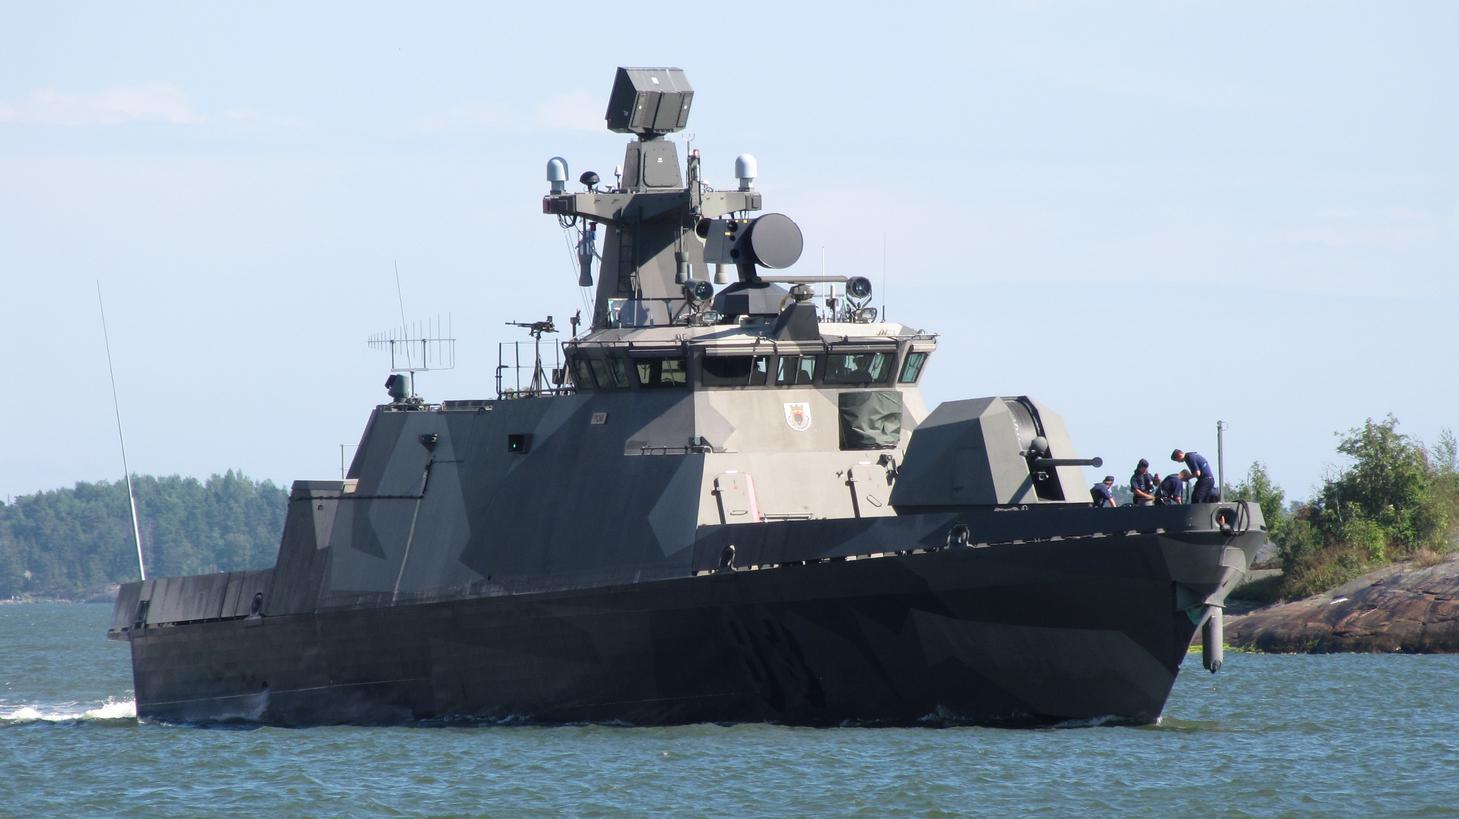 A Haminaclass Missile Boat Photo Courtesy Of Wikipediamons